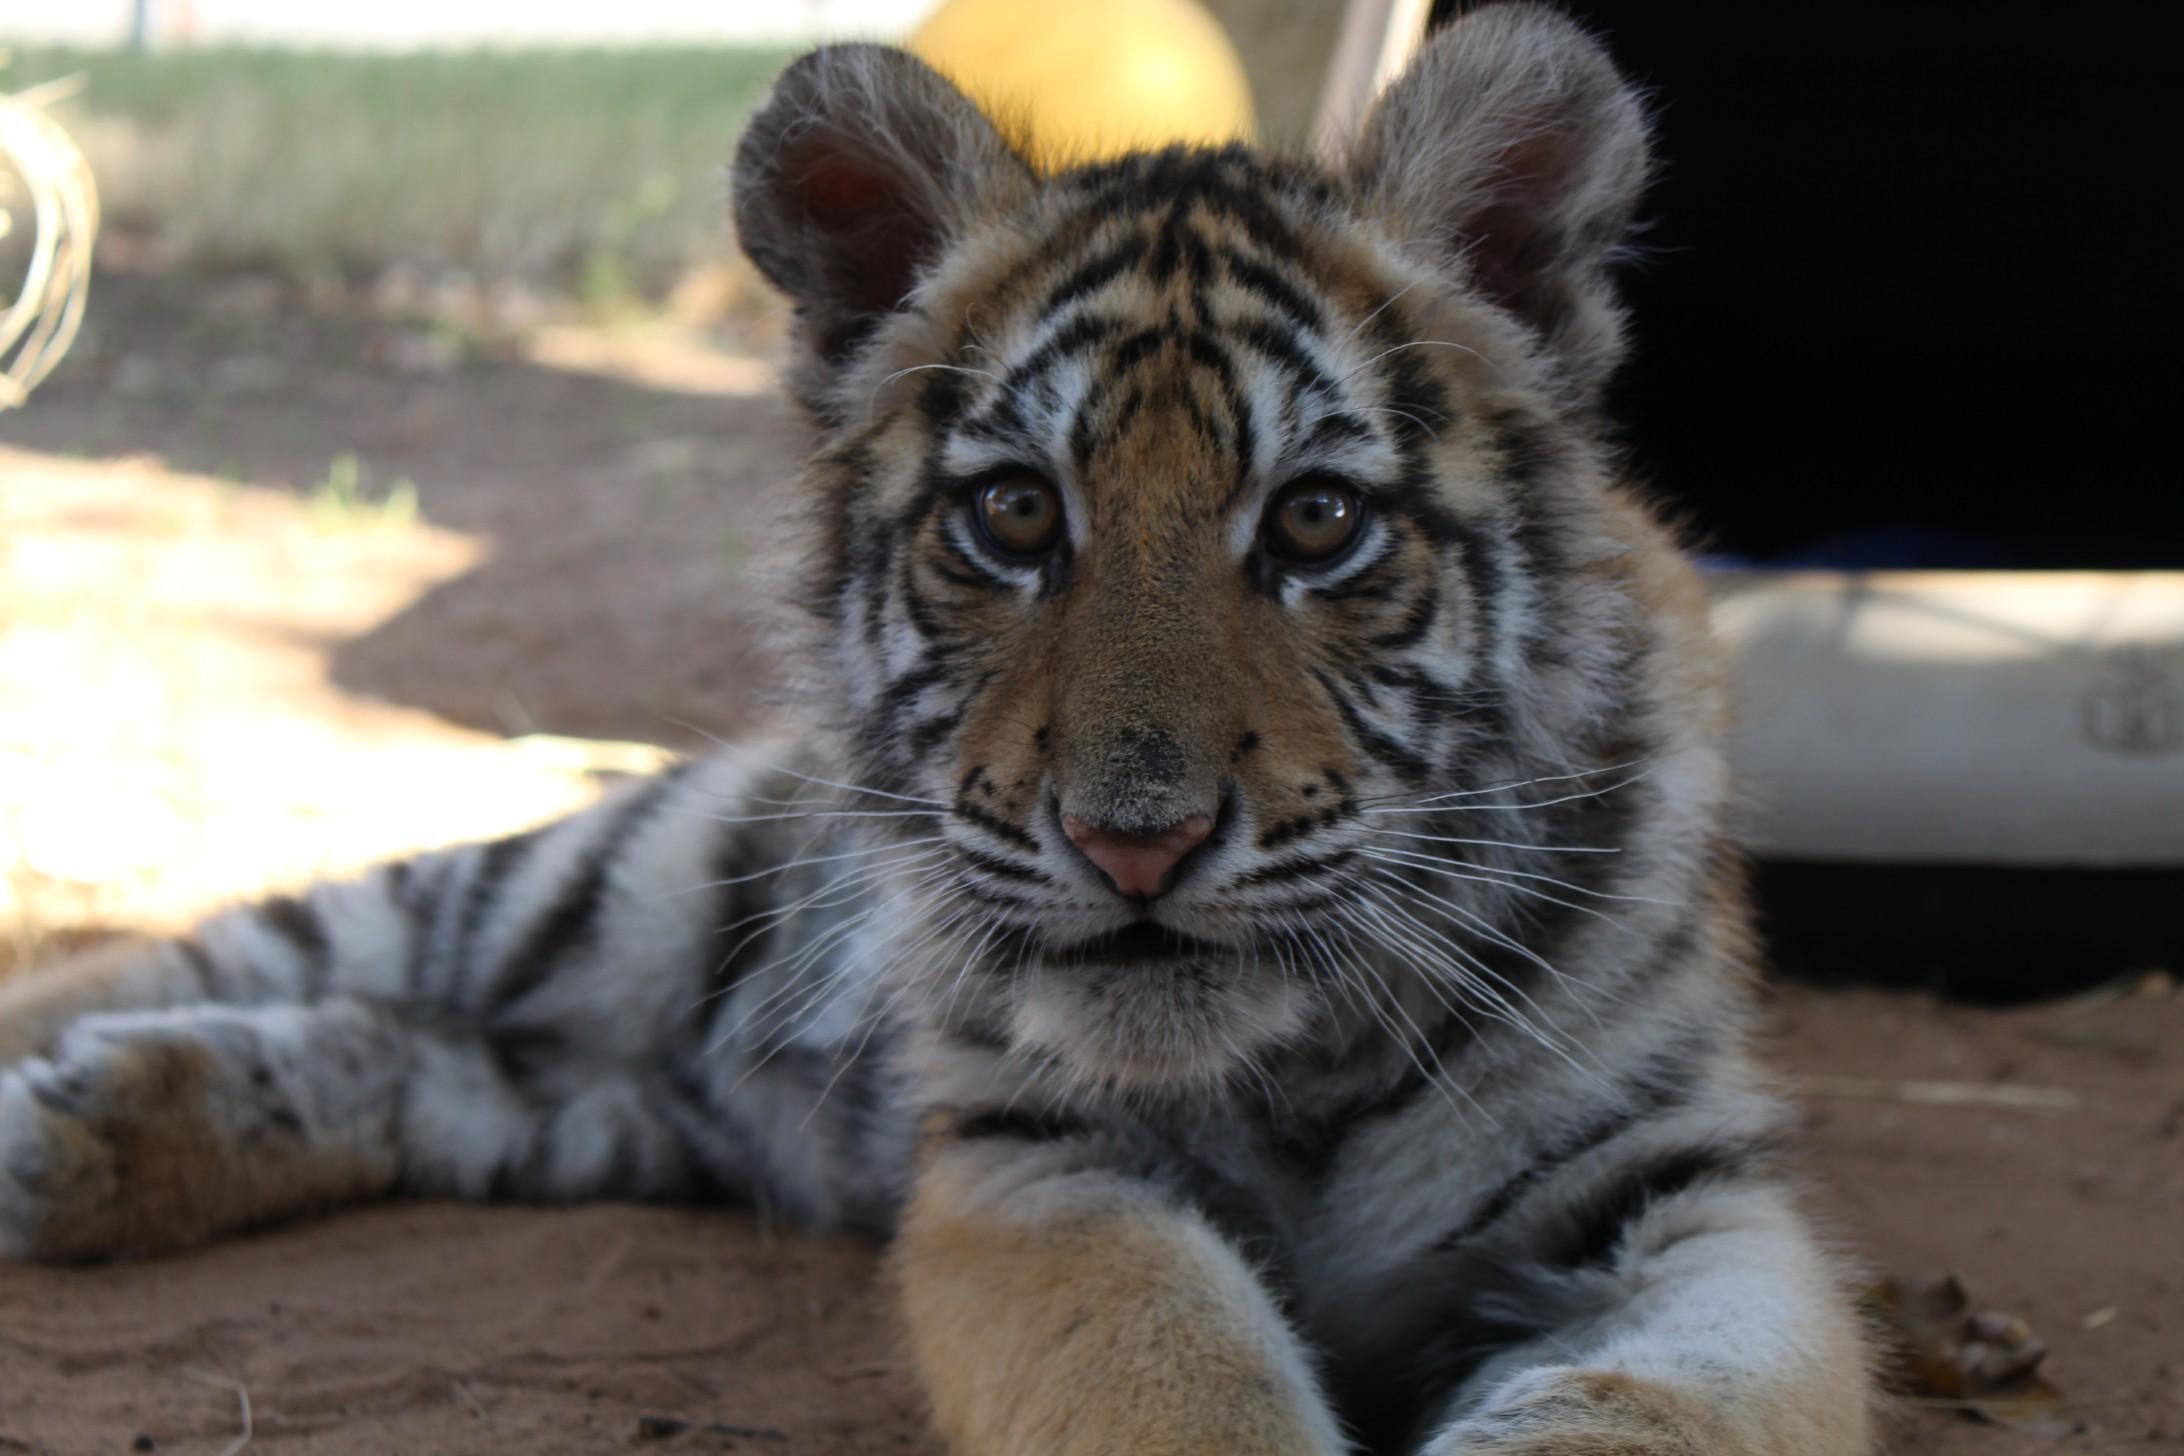 Mika the tiger cub